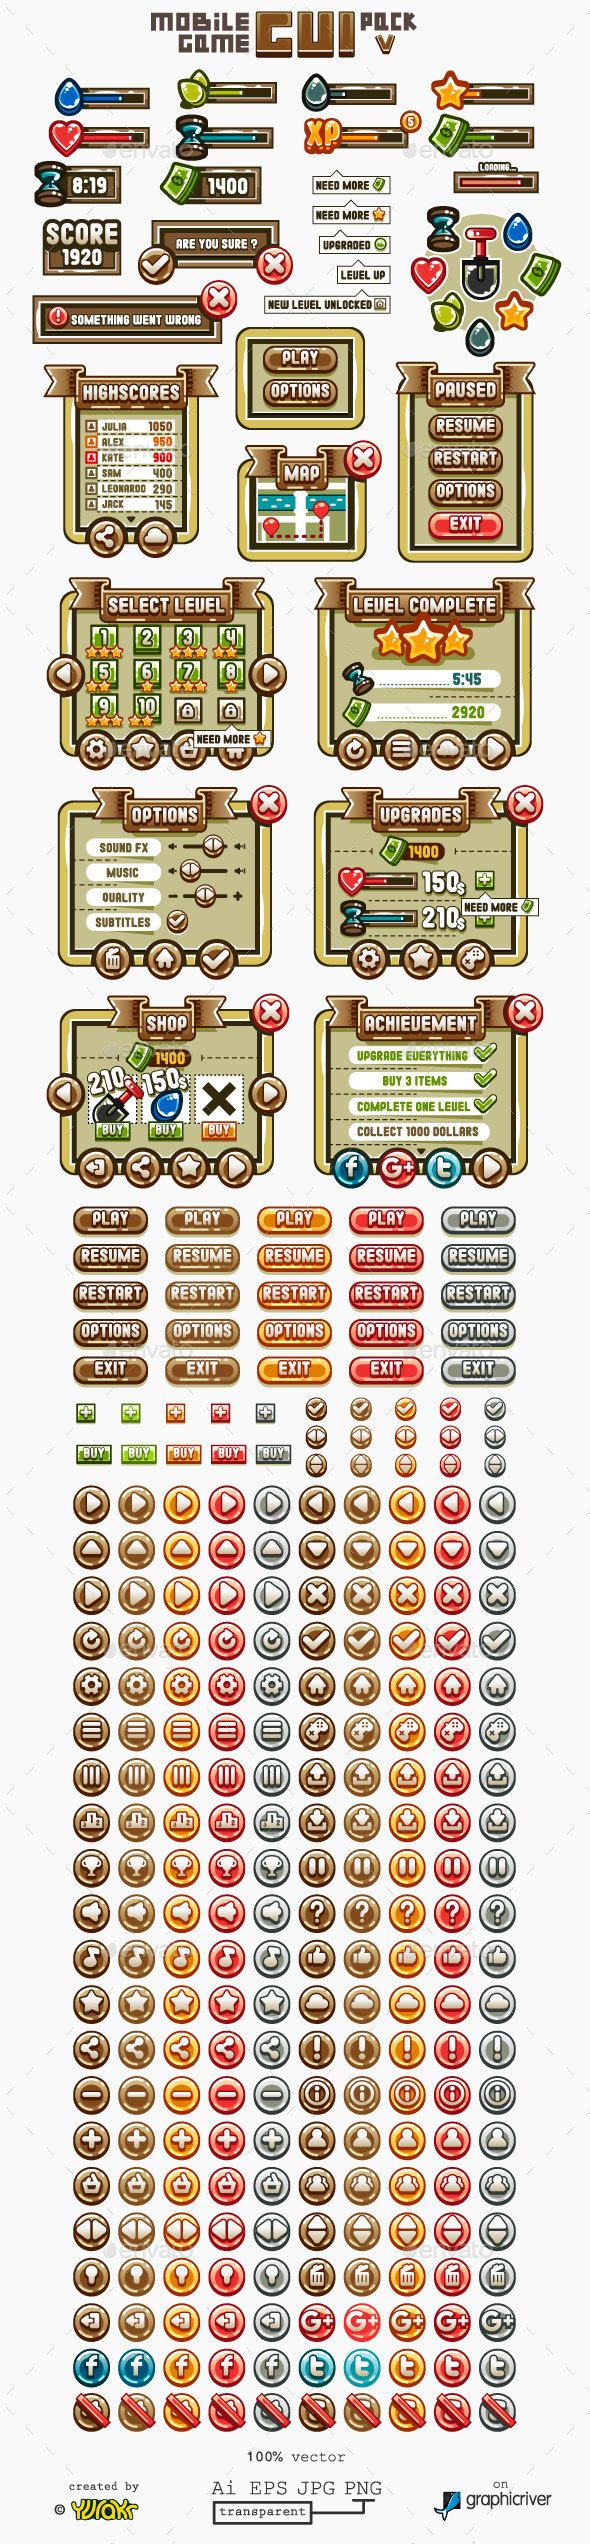 Mobile Game GUI Template Transparent PNG, JPG Image, Vector EPS, AI Illustrator. Download here: http://graphicriver.net/item/mobile-game-gui-pack-5/15504102?ref=ksioks